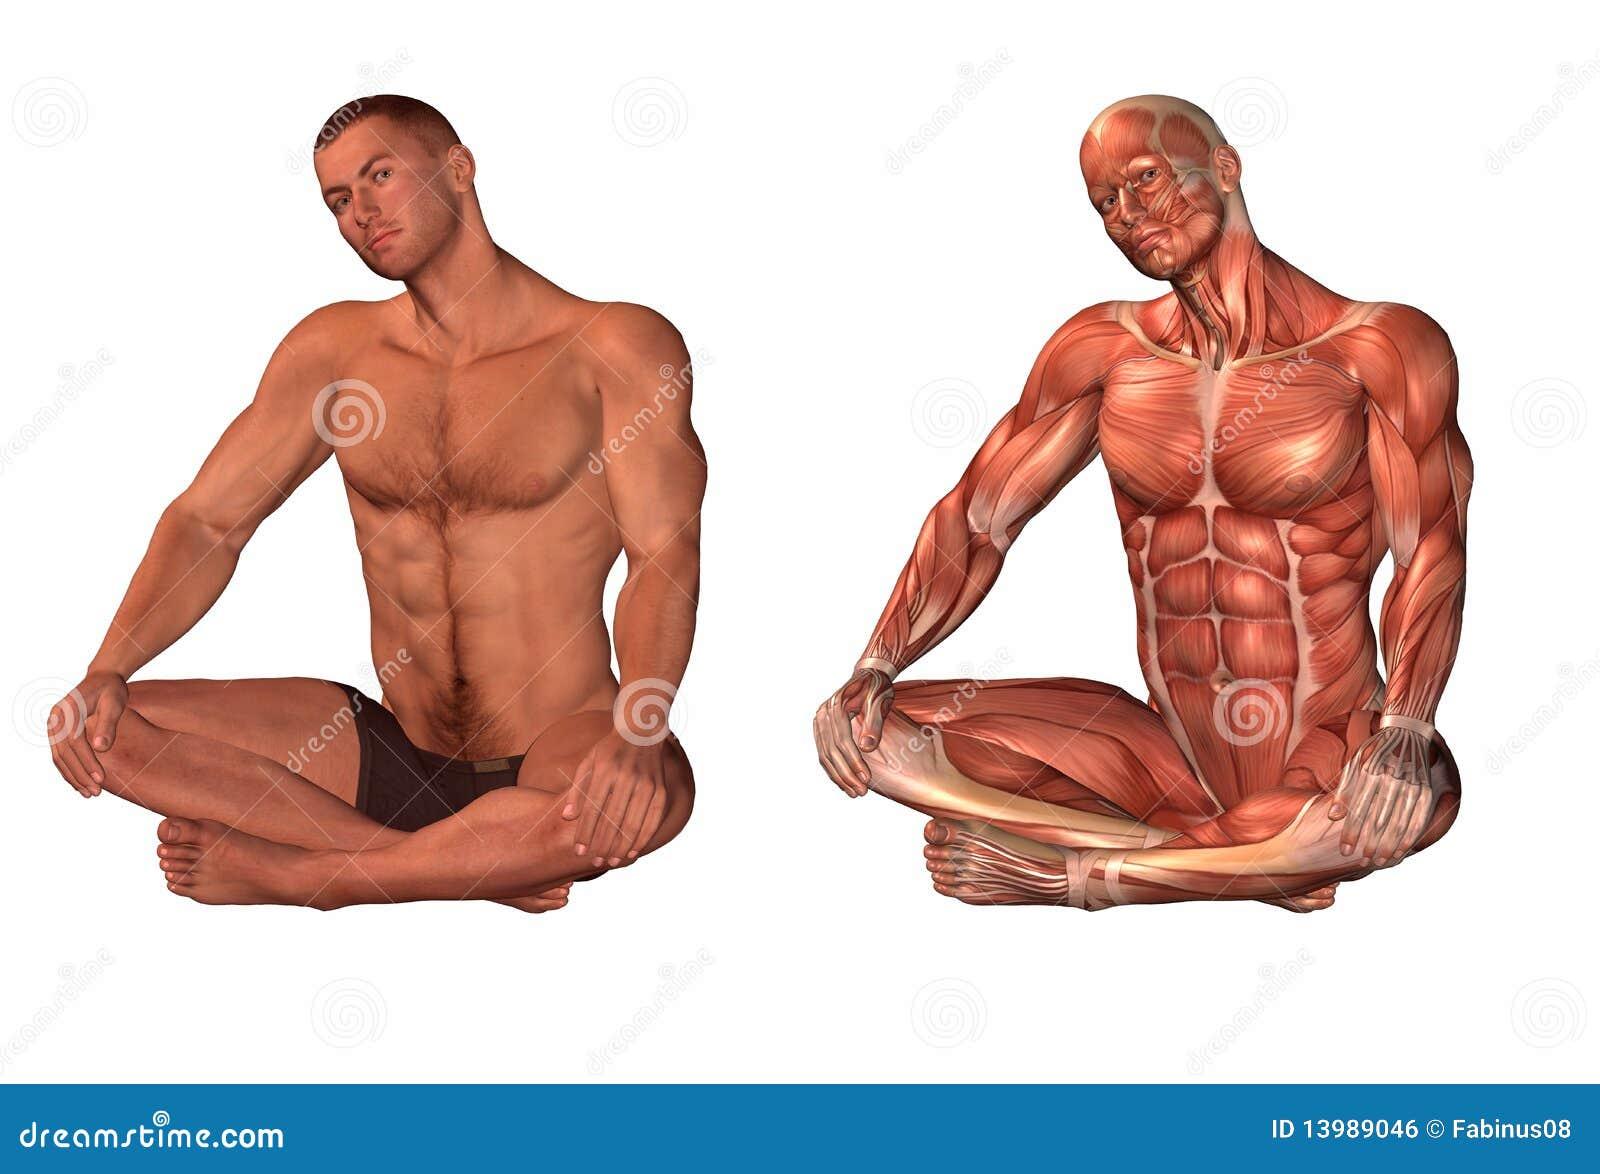 human muscle body – applecool, Muscles